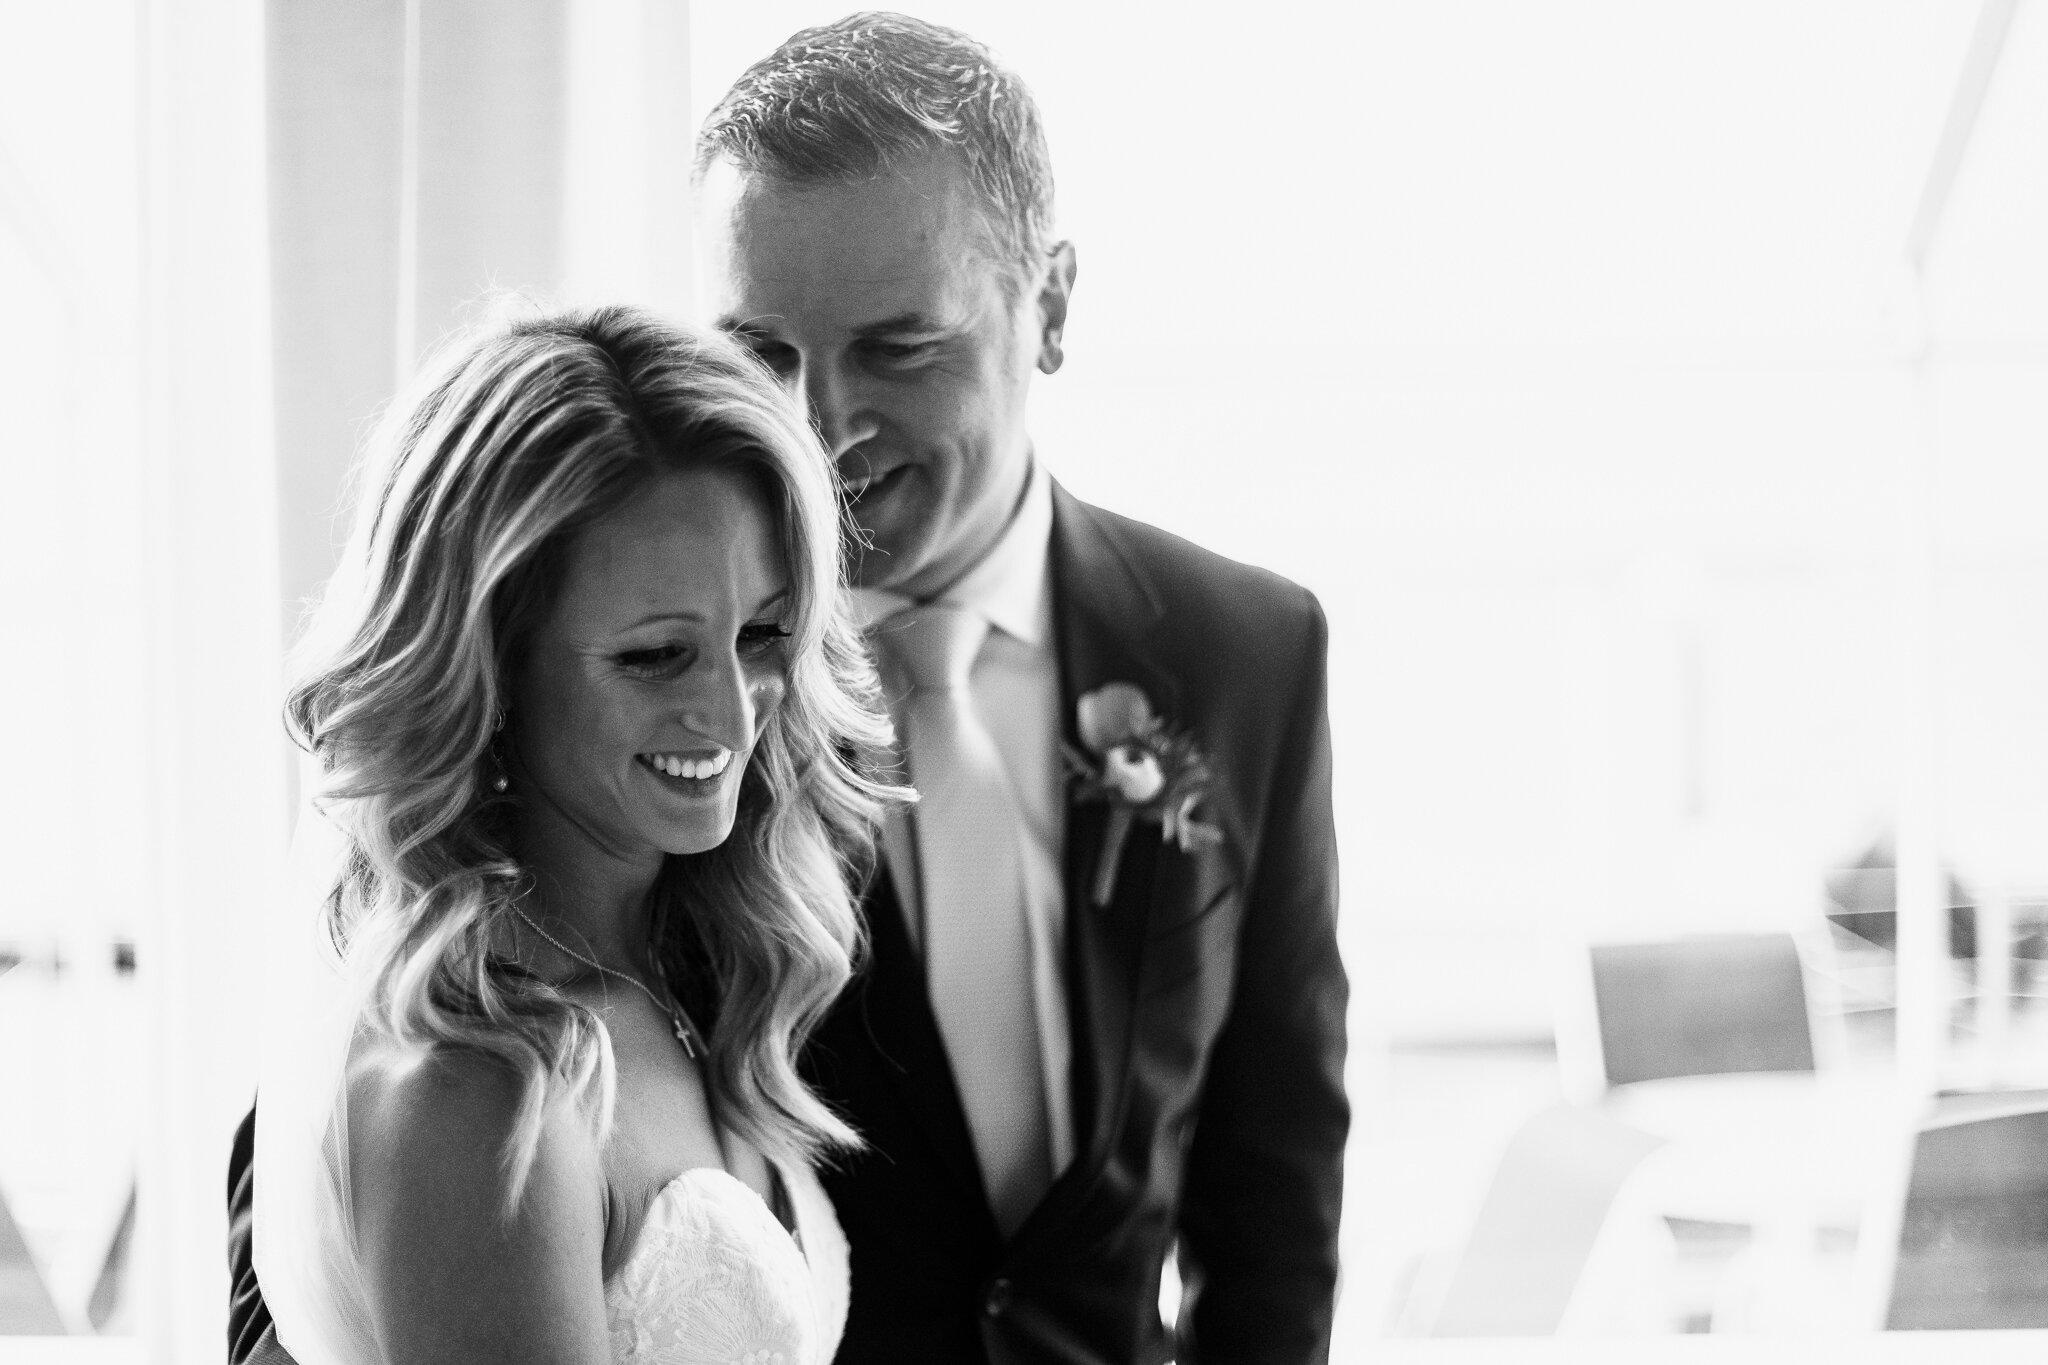 Snell-Ocean-City-Yacht-Club-New-Jersey-Wedding-Photographer-13.JPG